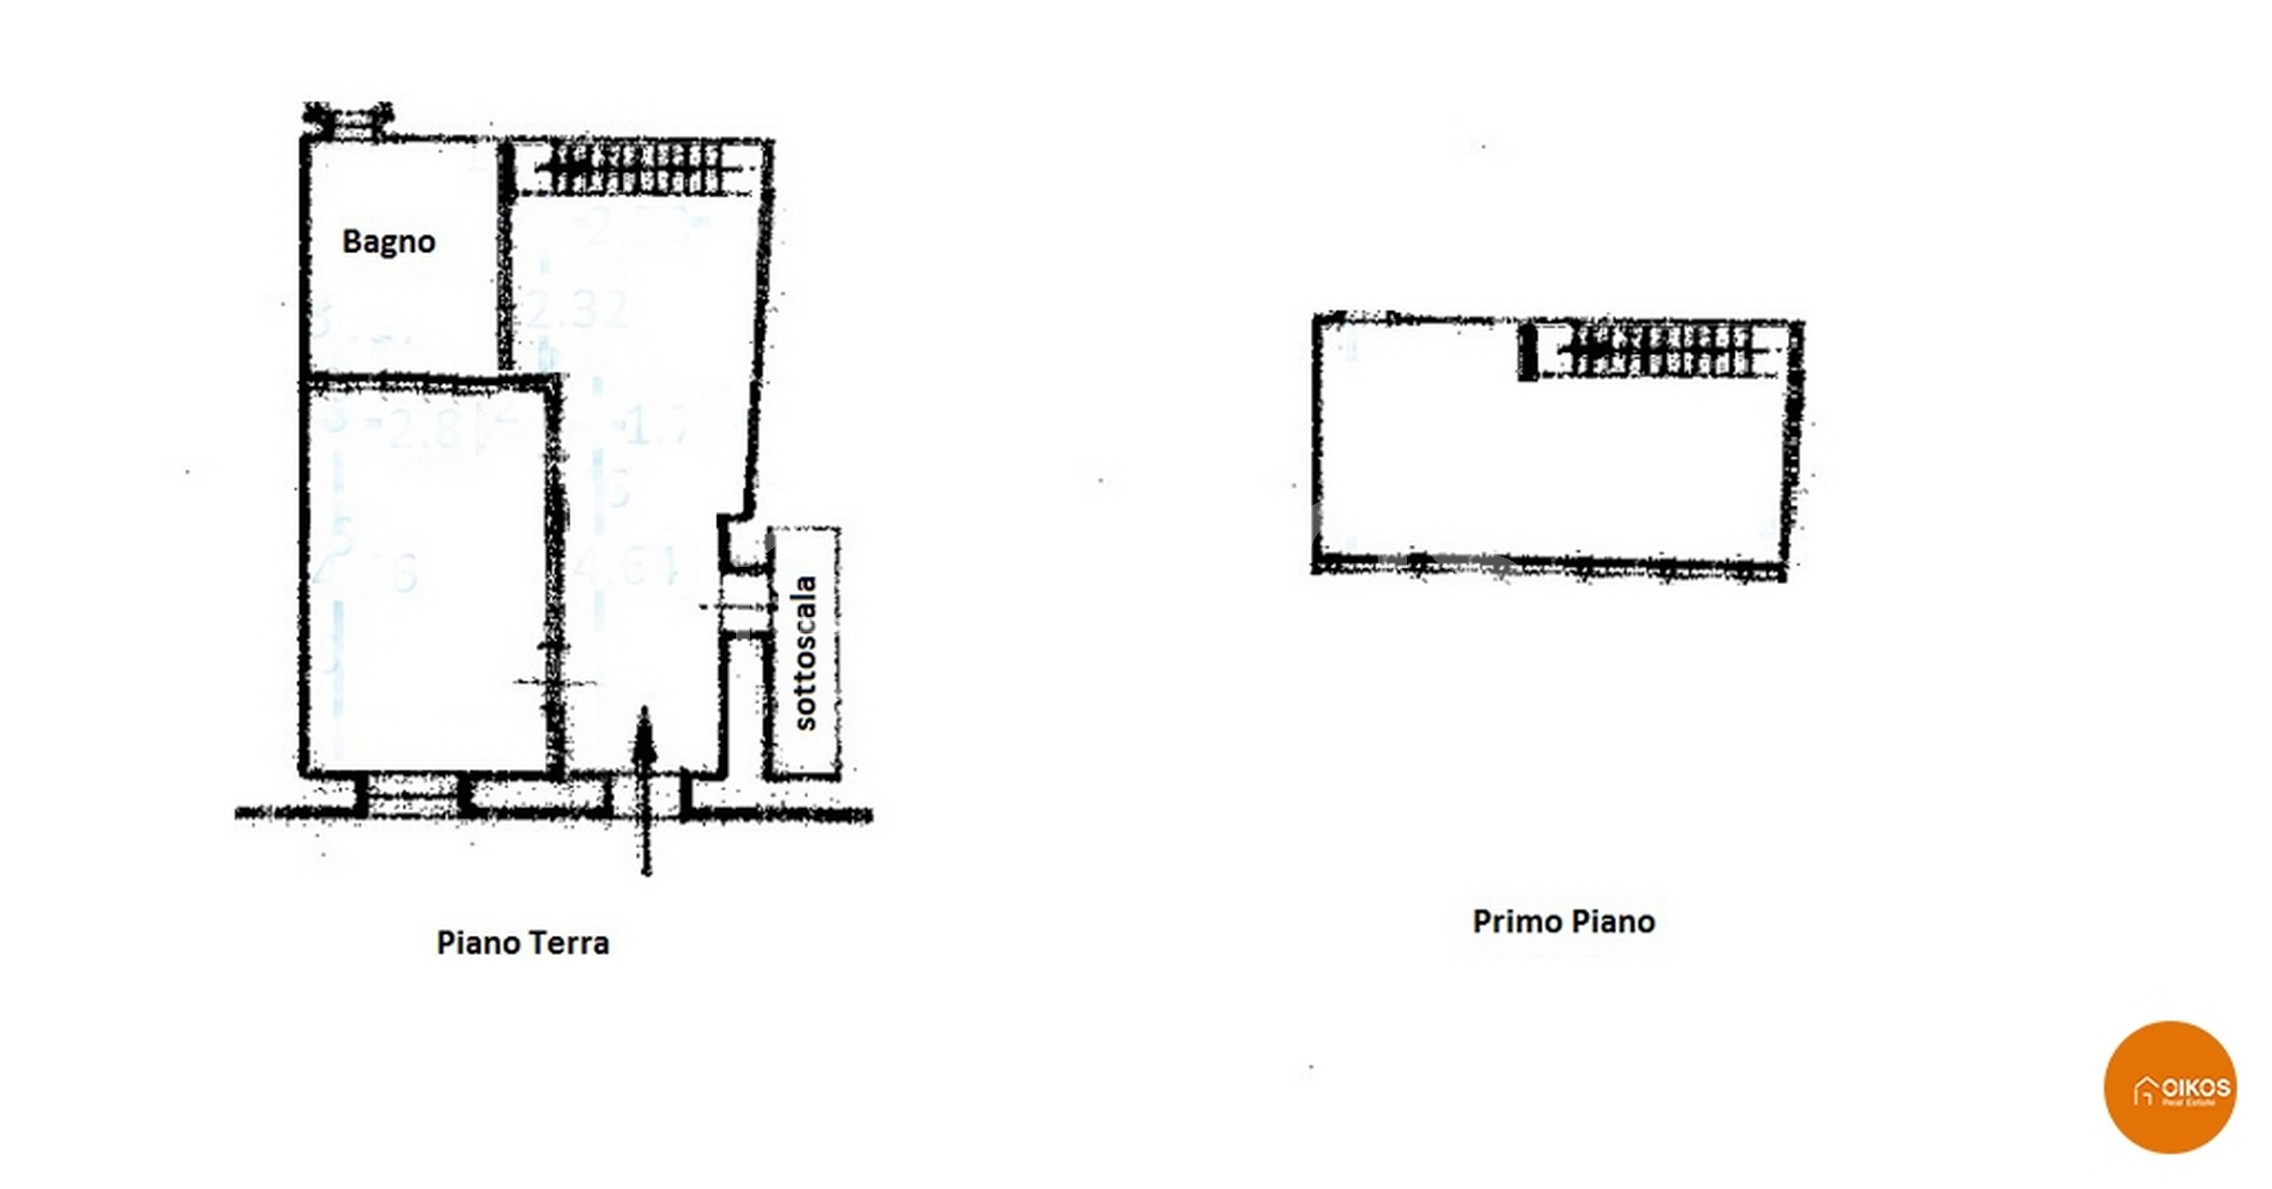 Casa indipendente in via Amante, Noto planimetria